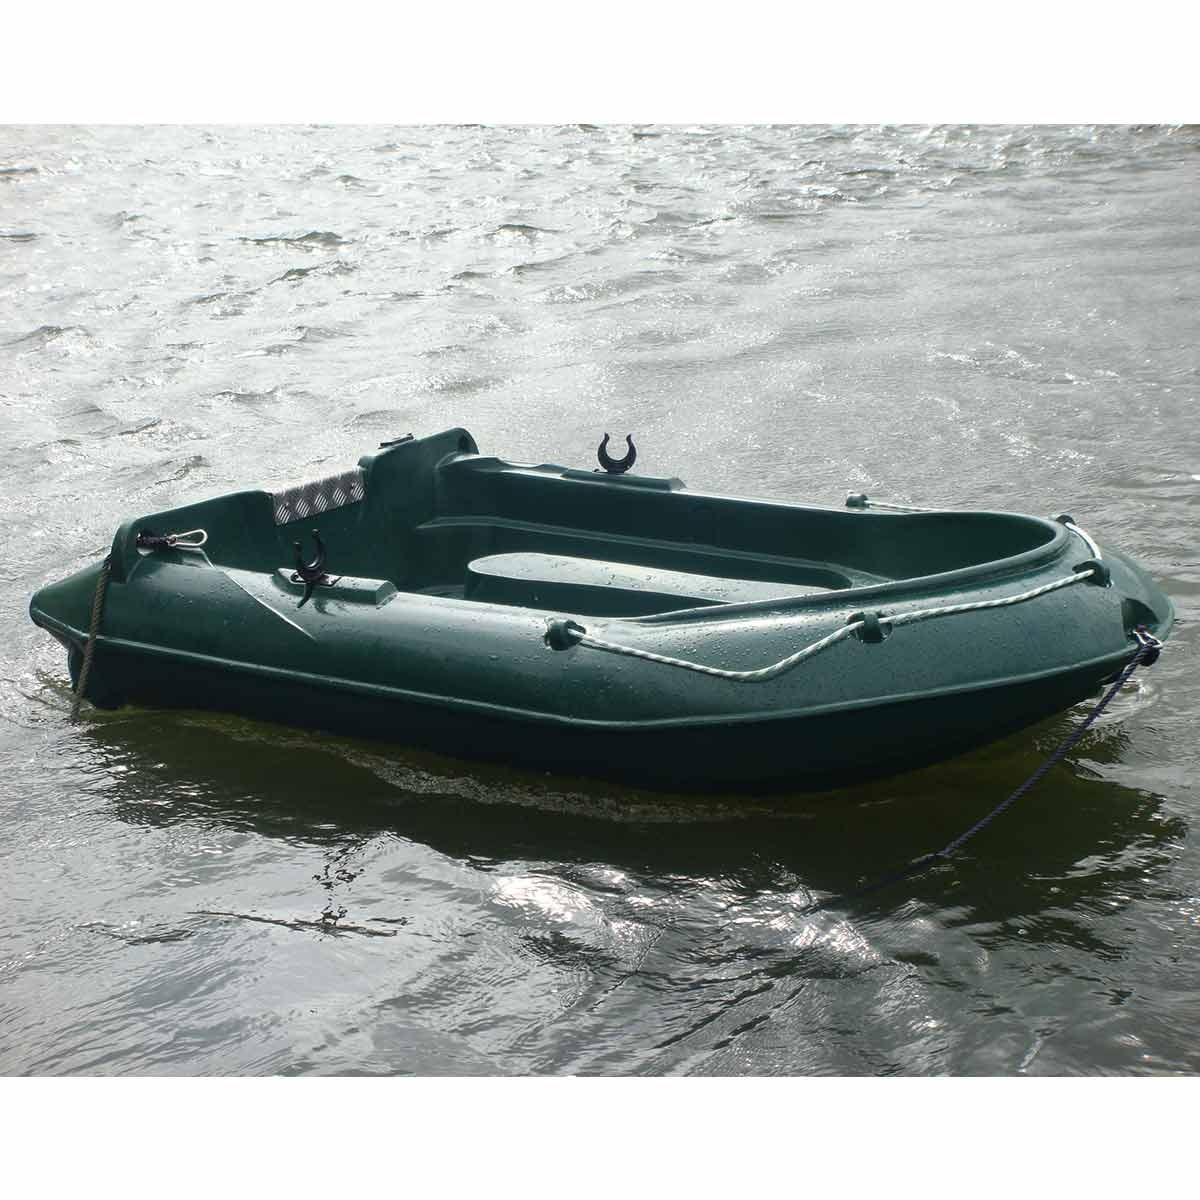 Small Boat Wheels : Small boat wheels bing images